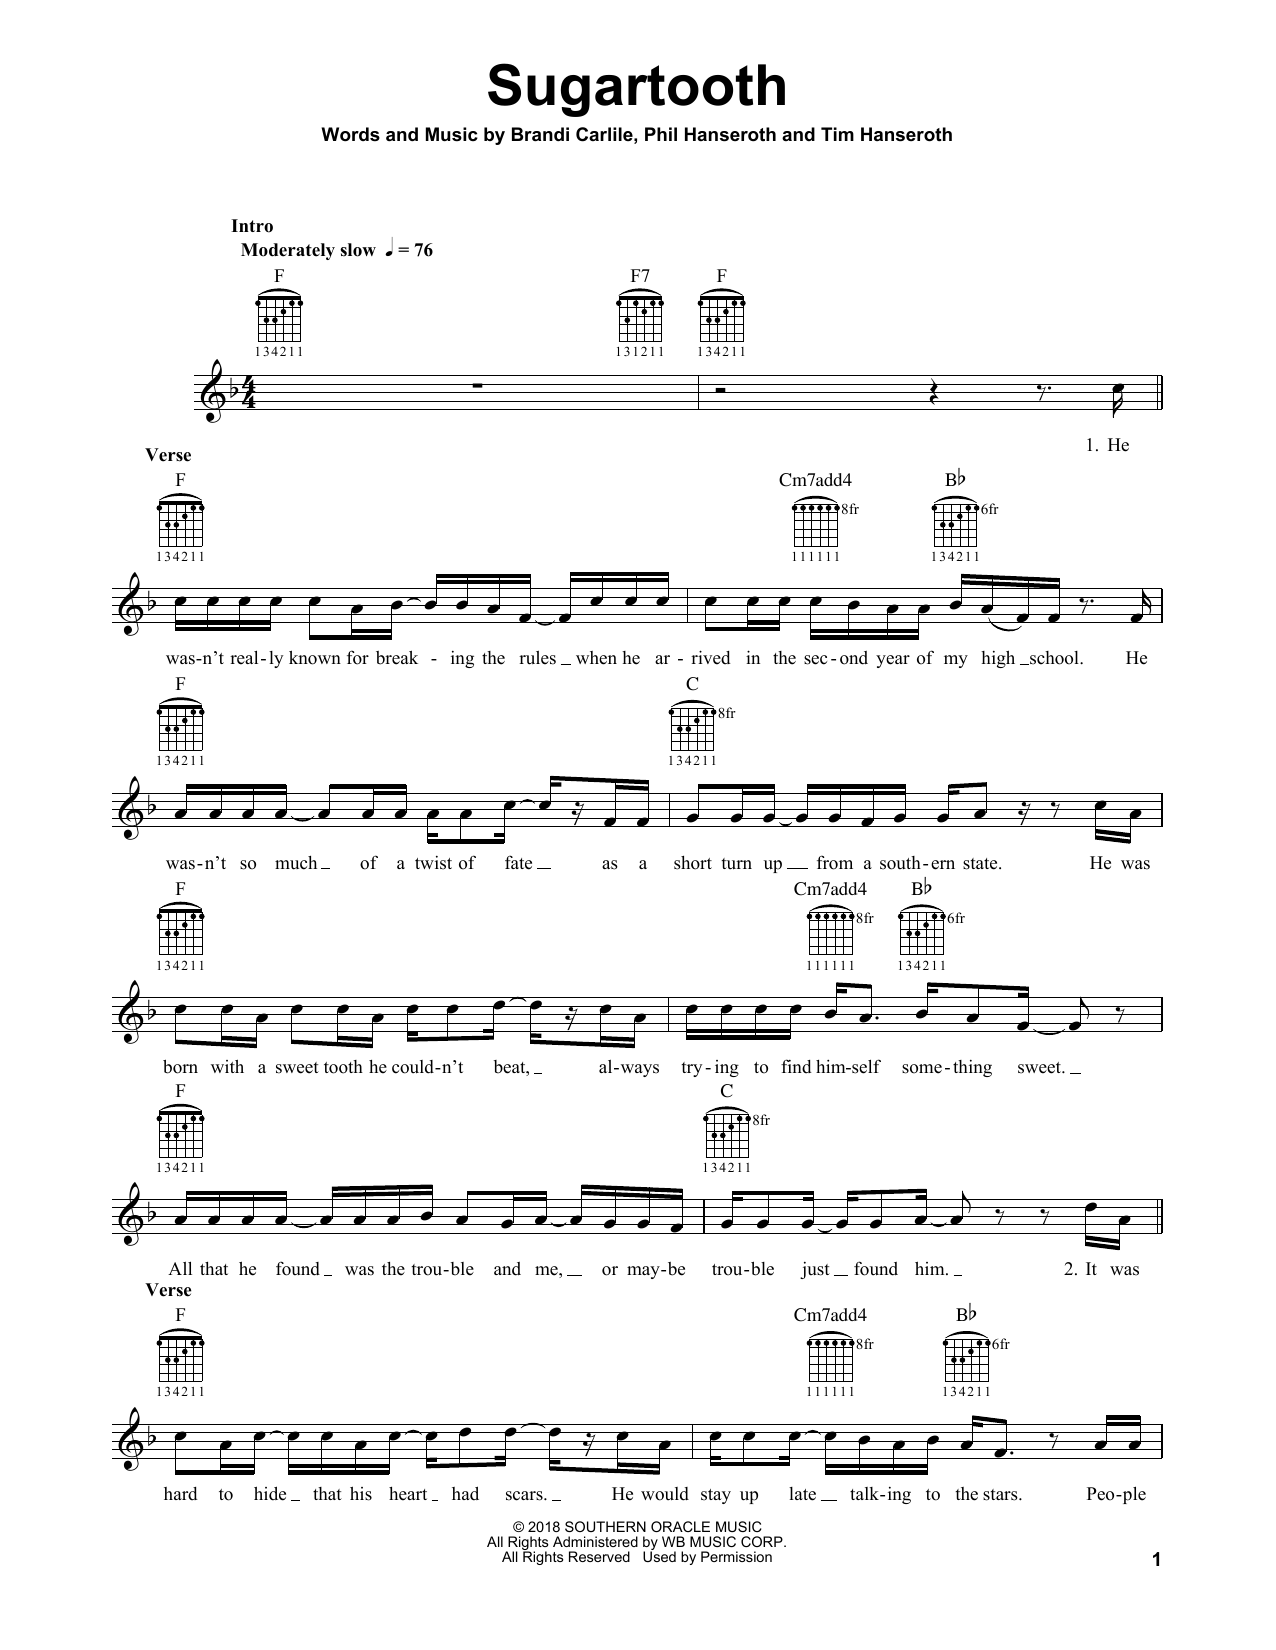 Sugartooth Sheet Music